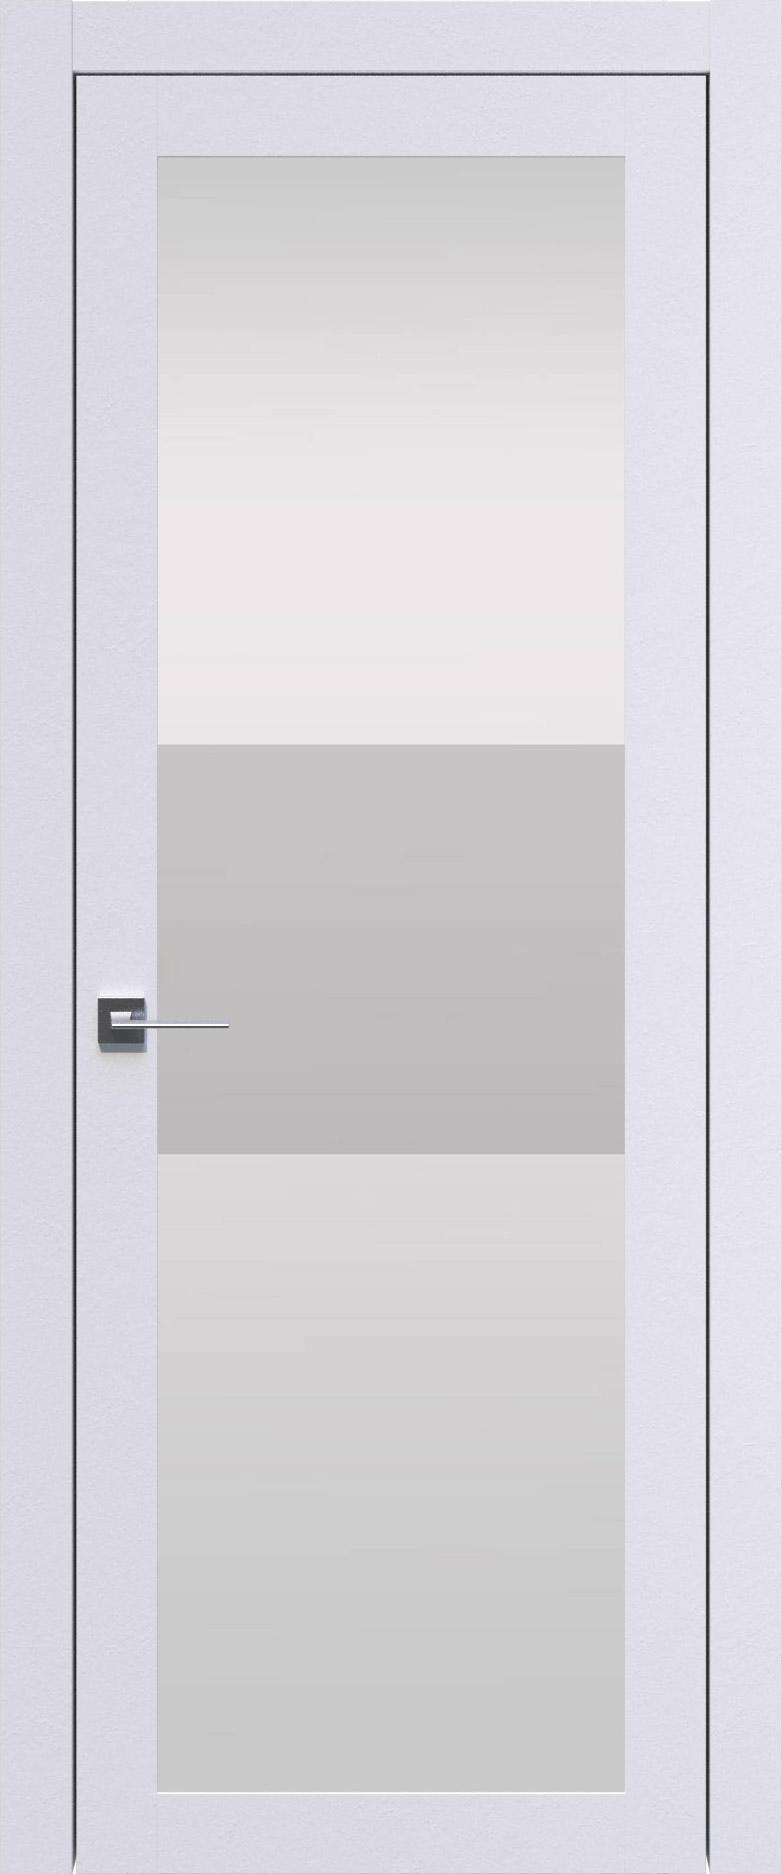 Tivoli З-4 цвет - Арктик белый Со стеклом (ДО)